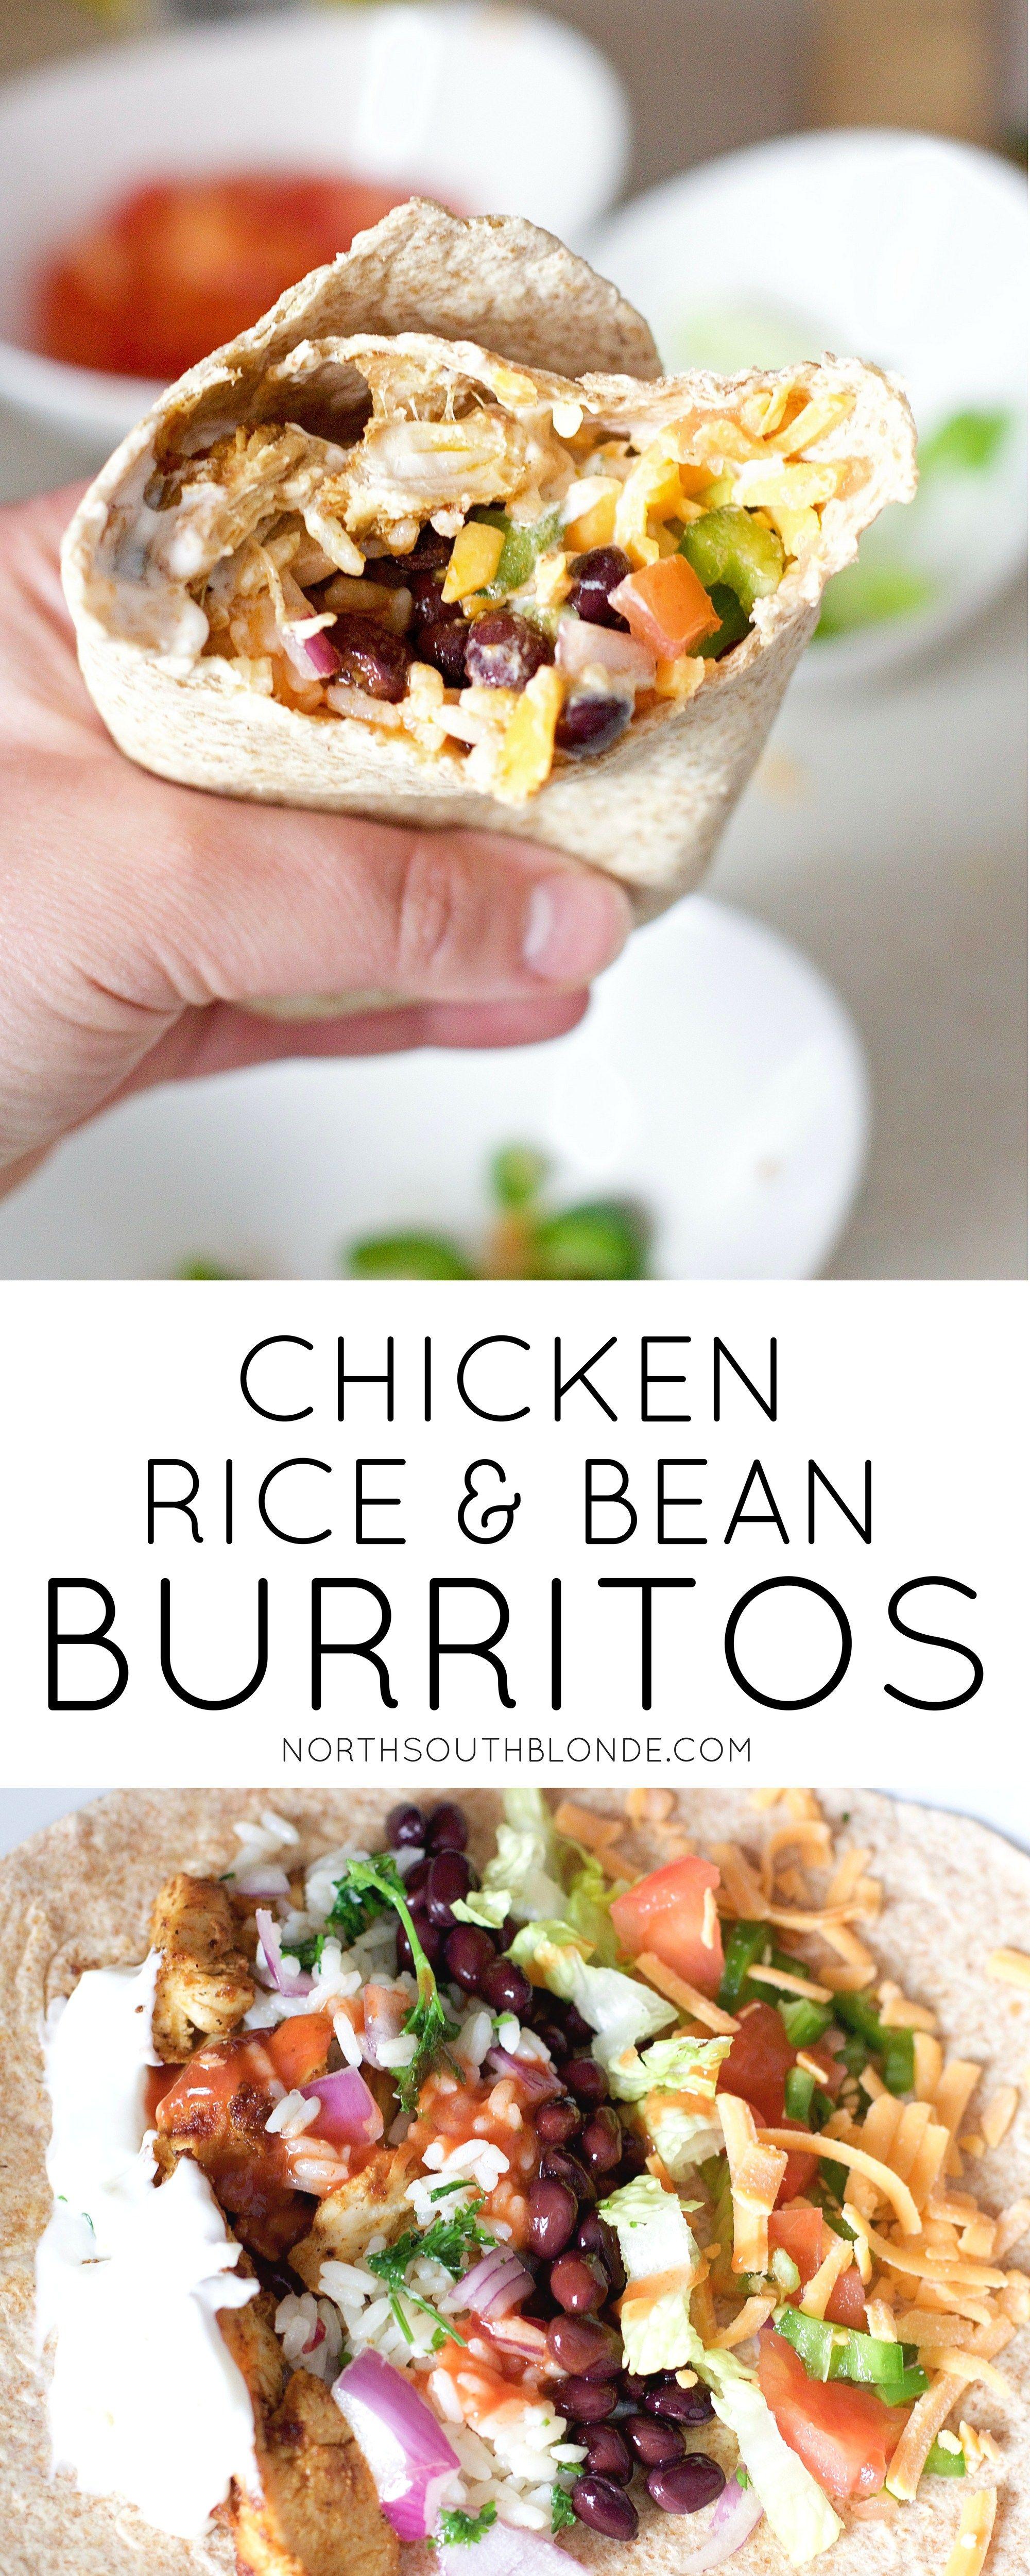 Chicken Rice And Black Bean Burritos Recipe Easy Burrito Recipe Lunch Recipes Recipes